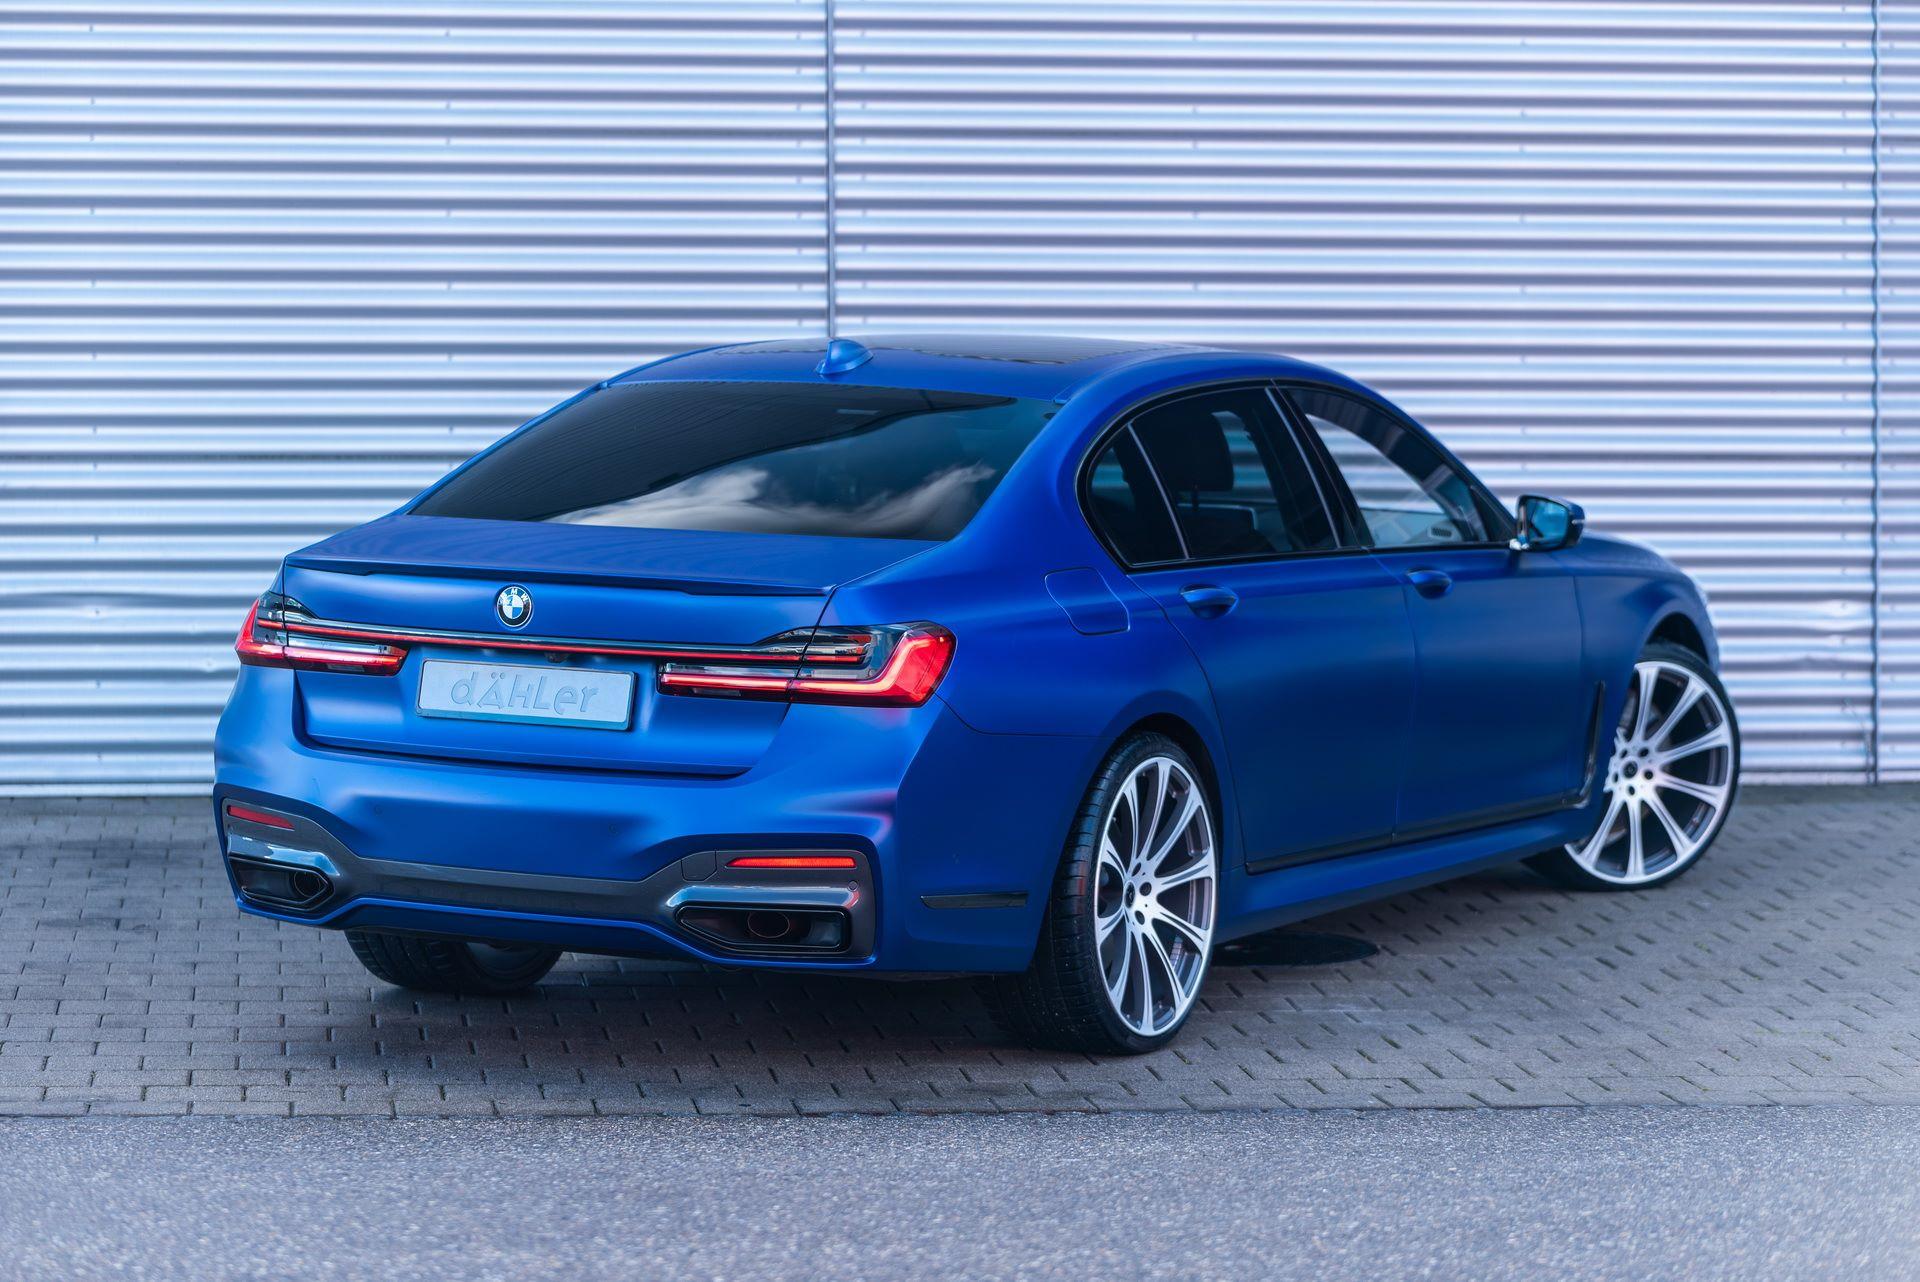 BMW-745Le-xDrive-by-Dahler-3